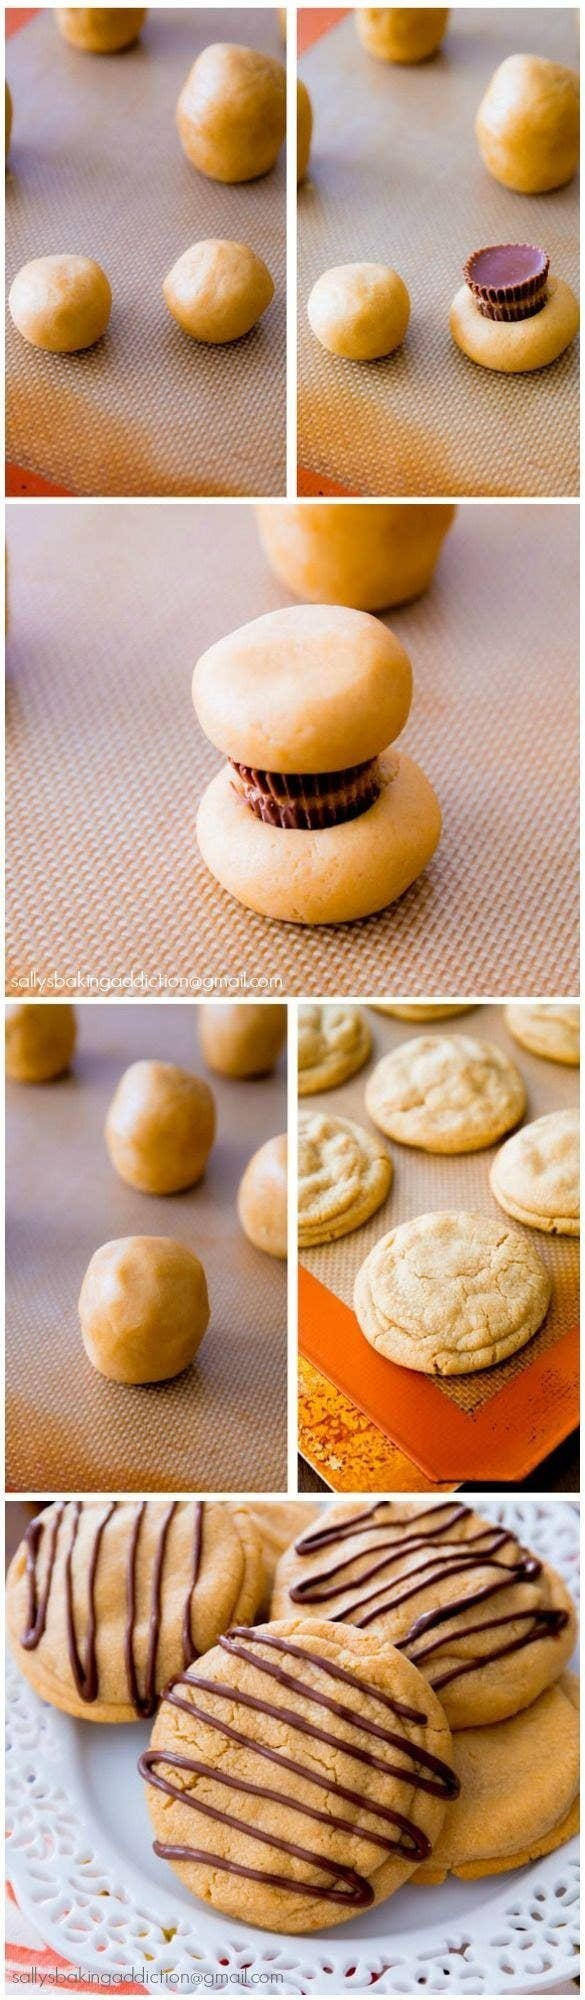 Recipe: Reeses-Stuffed Peanut Butter Cookies